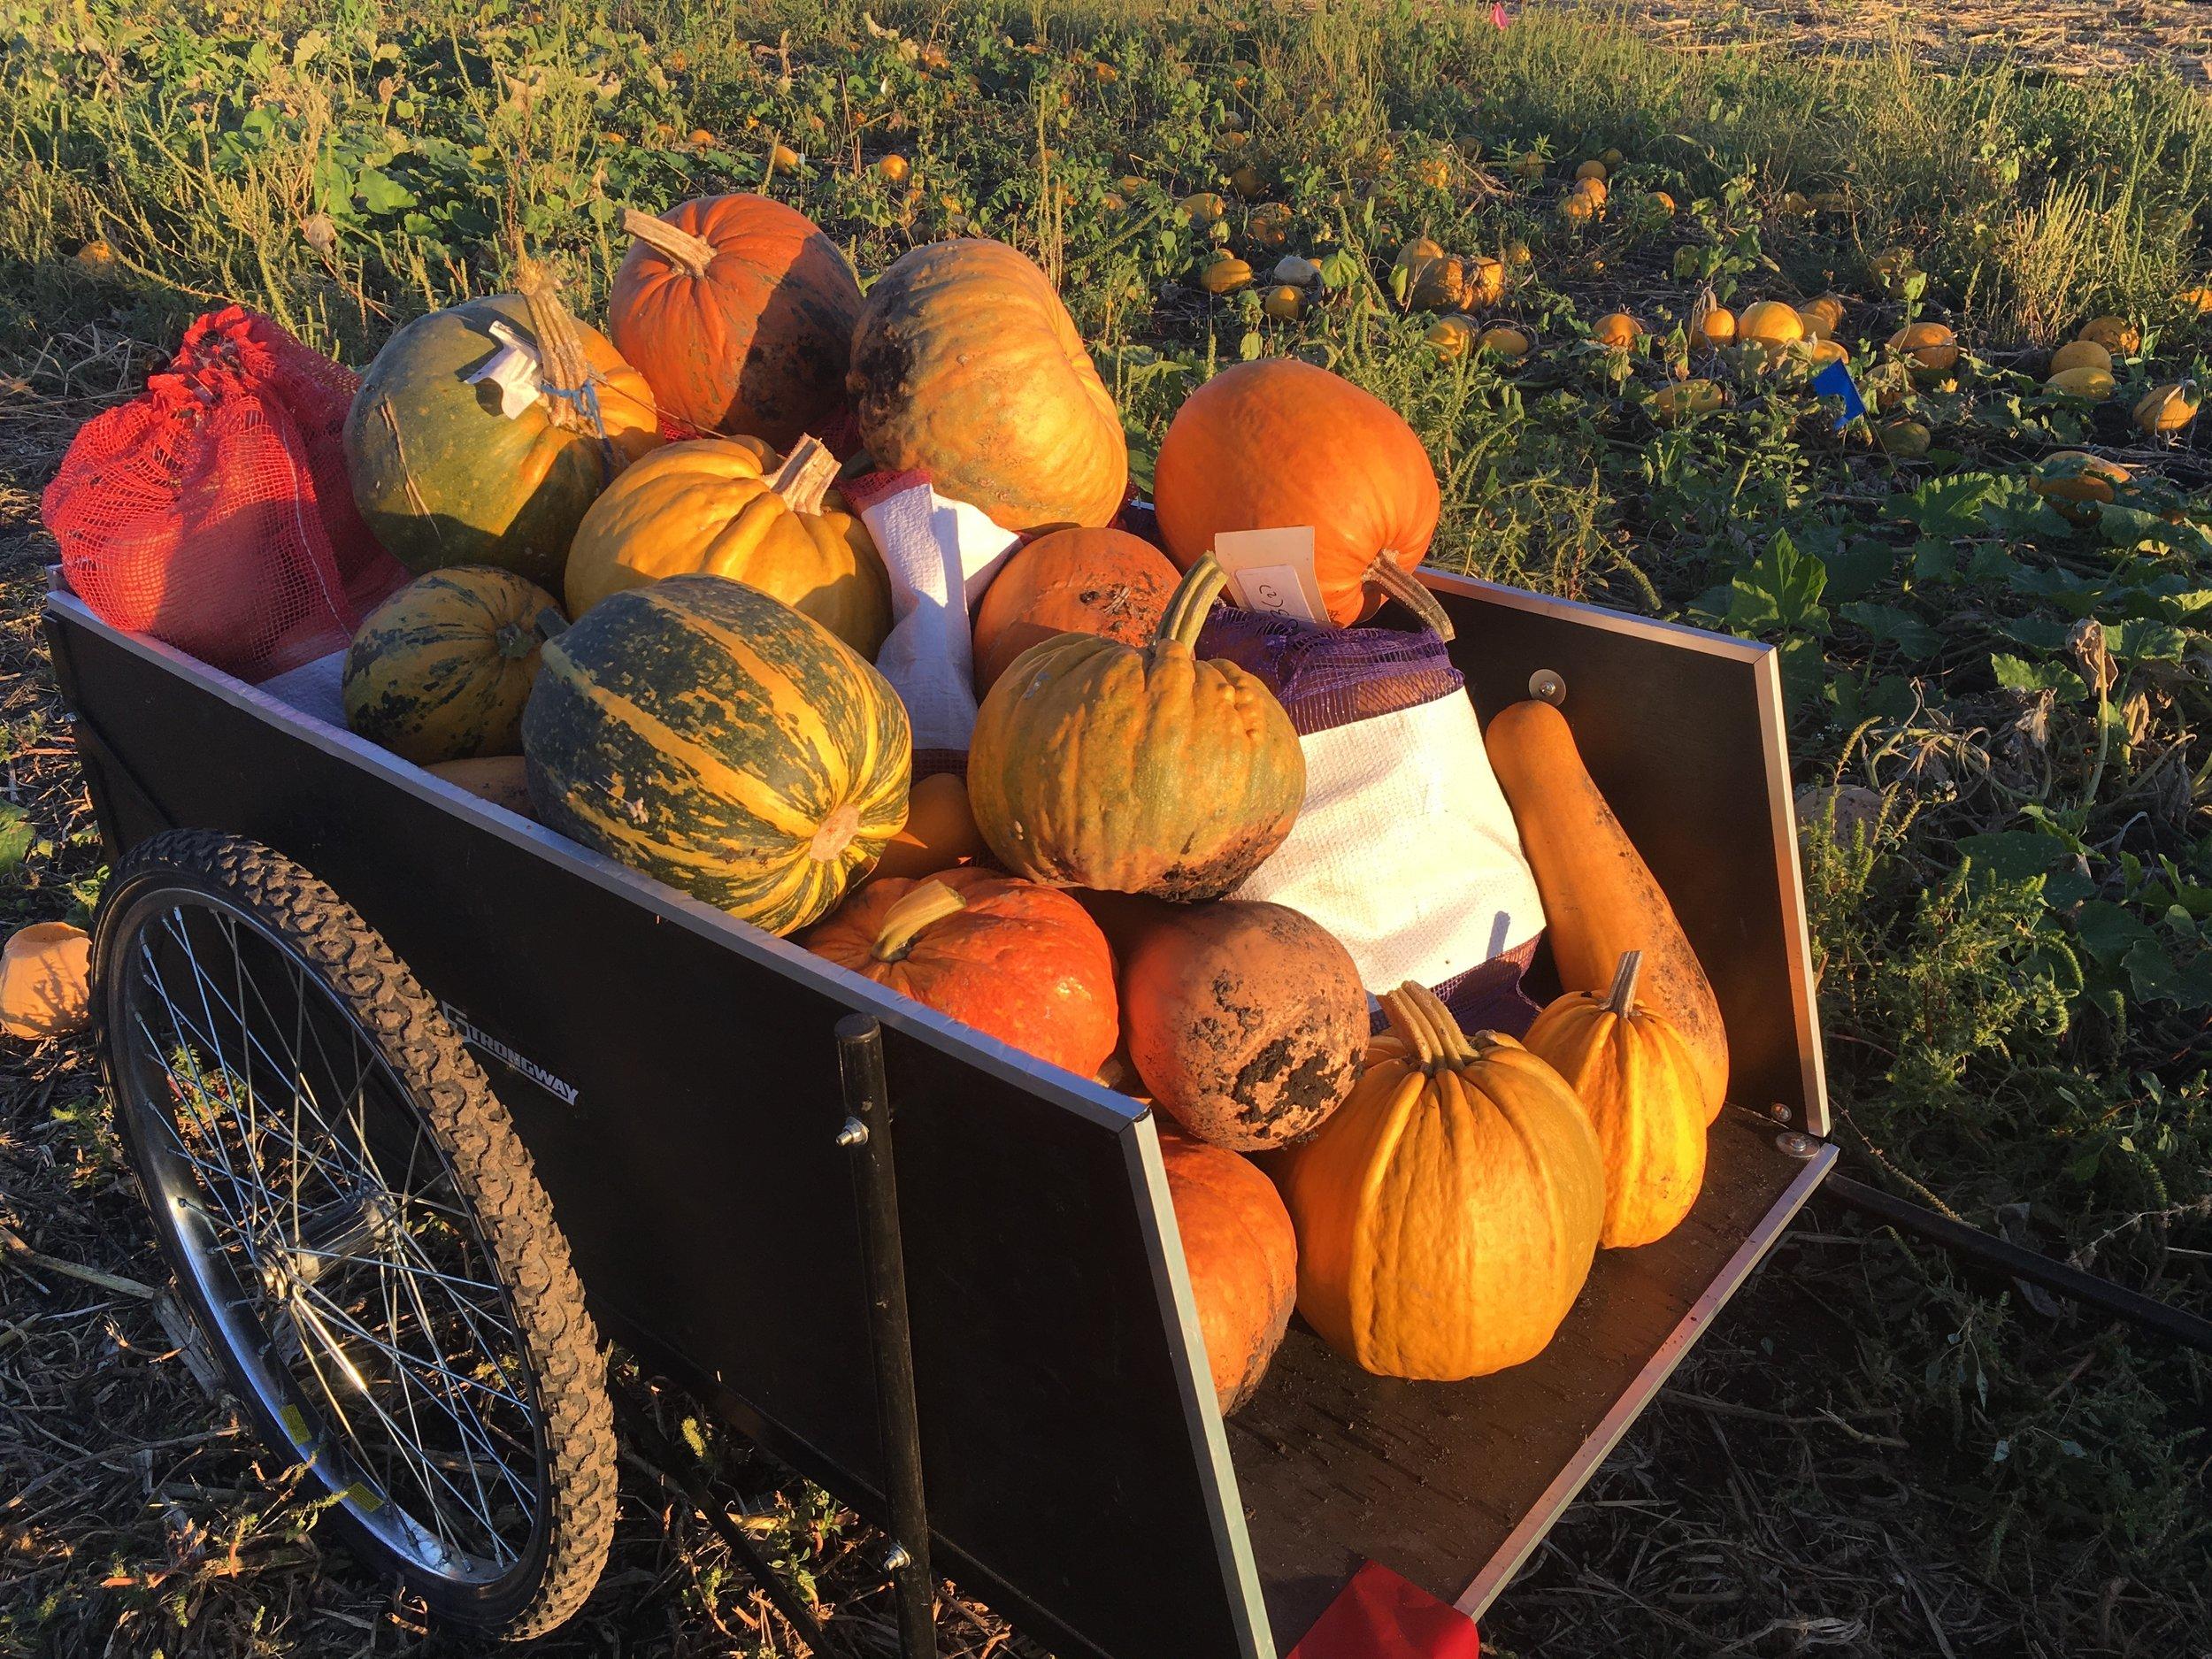 Kakai Squash, Valovsky Pumpkin, Omaha Pumpkin, Drew's Bumpy Squash, some random crosses from Ben's breeding project…